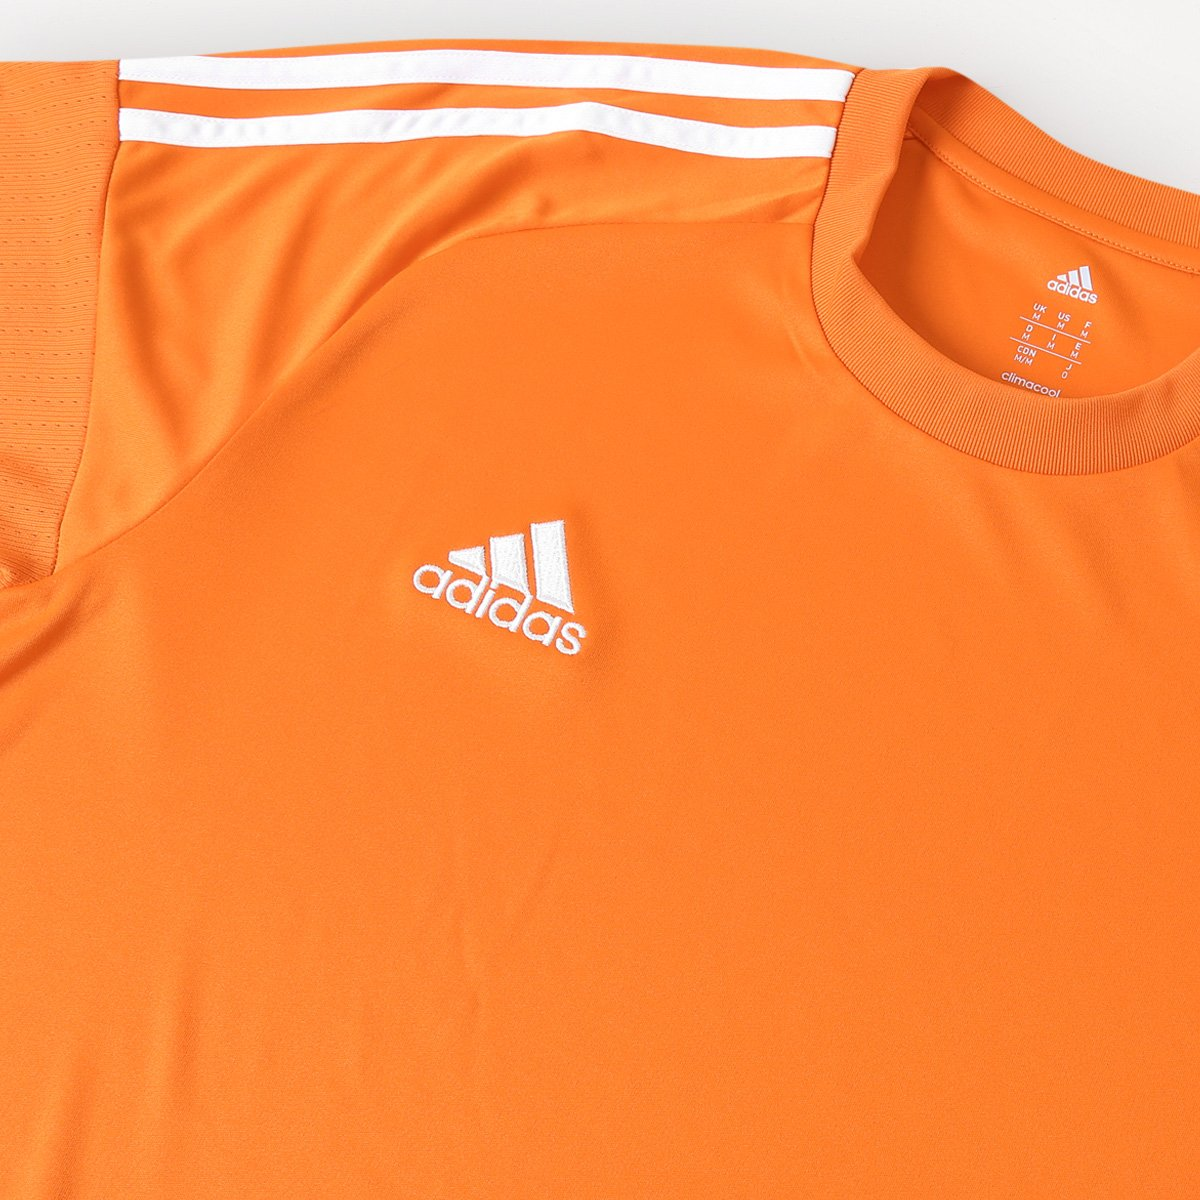 Camisa Adidas Regista 16 Masculina - Compre Agora  c3eb33d28f49b